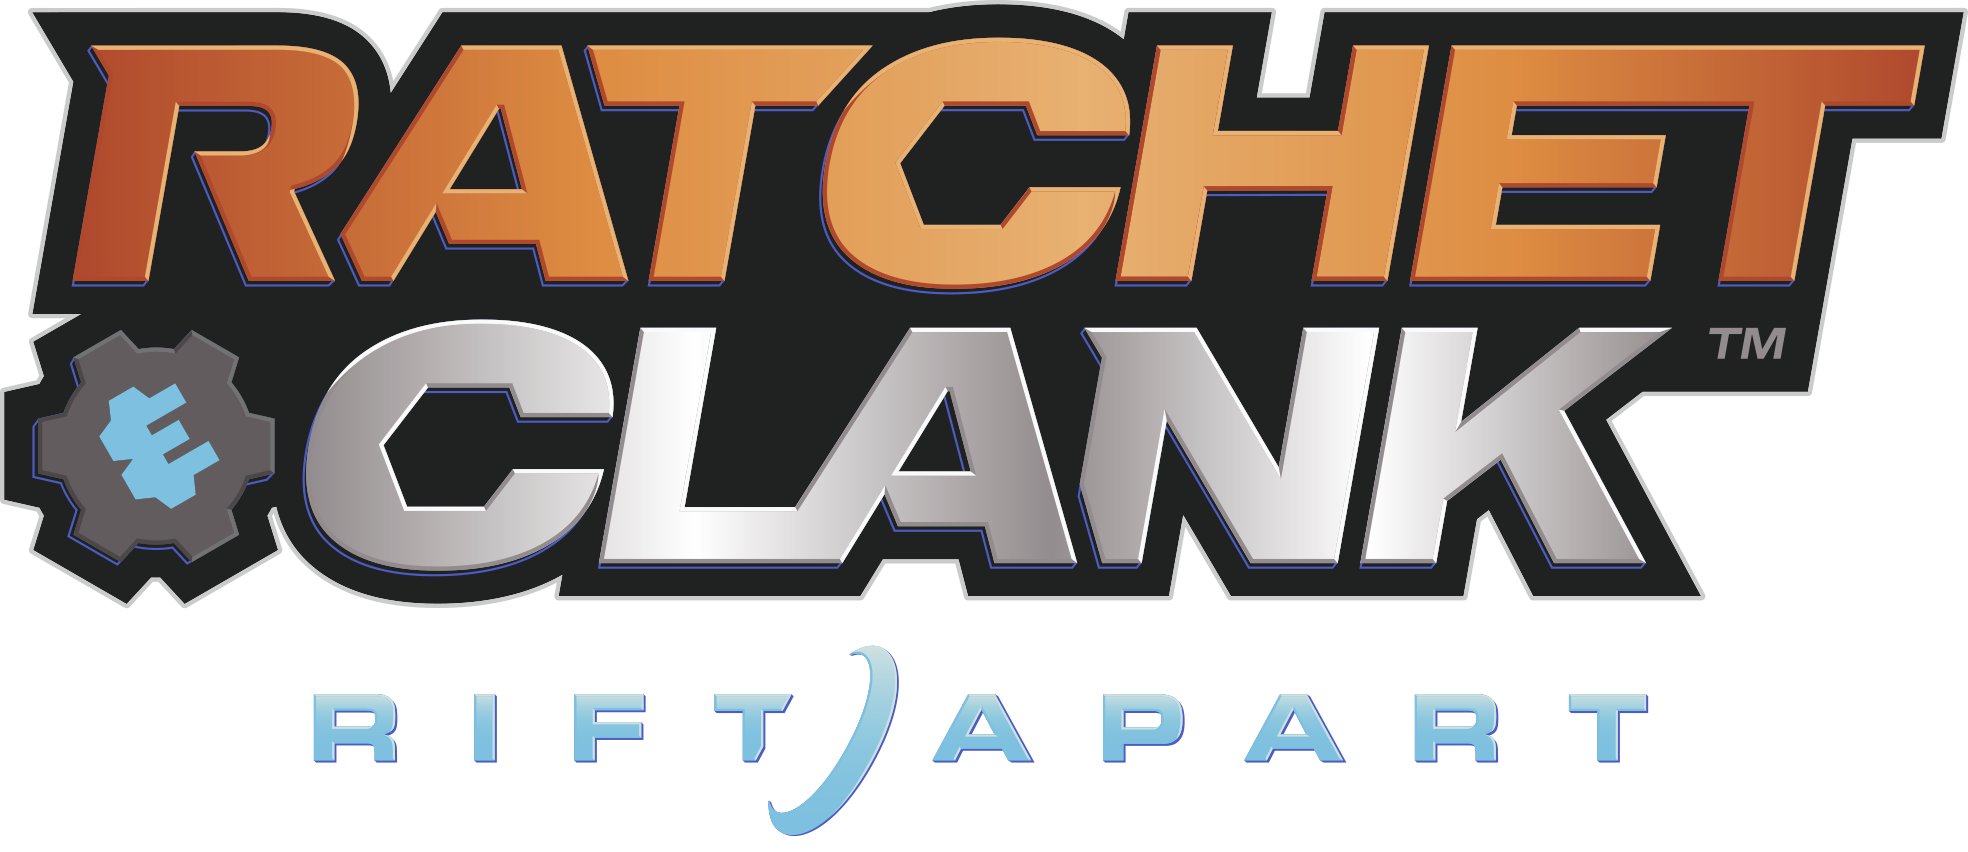 Ratchet & Clank: Rift Apart - Logo